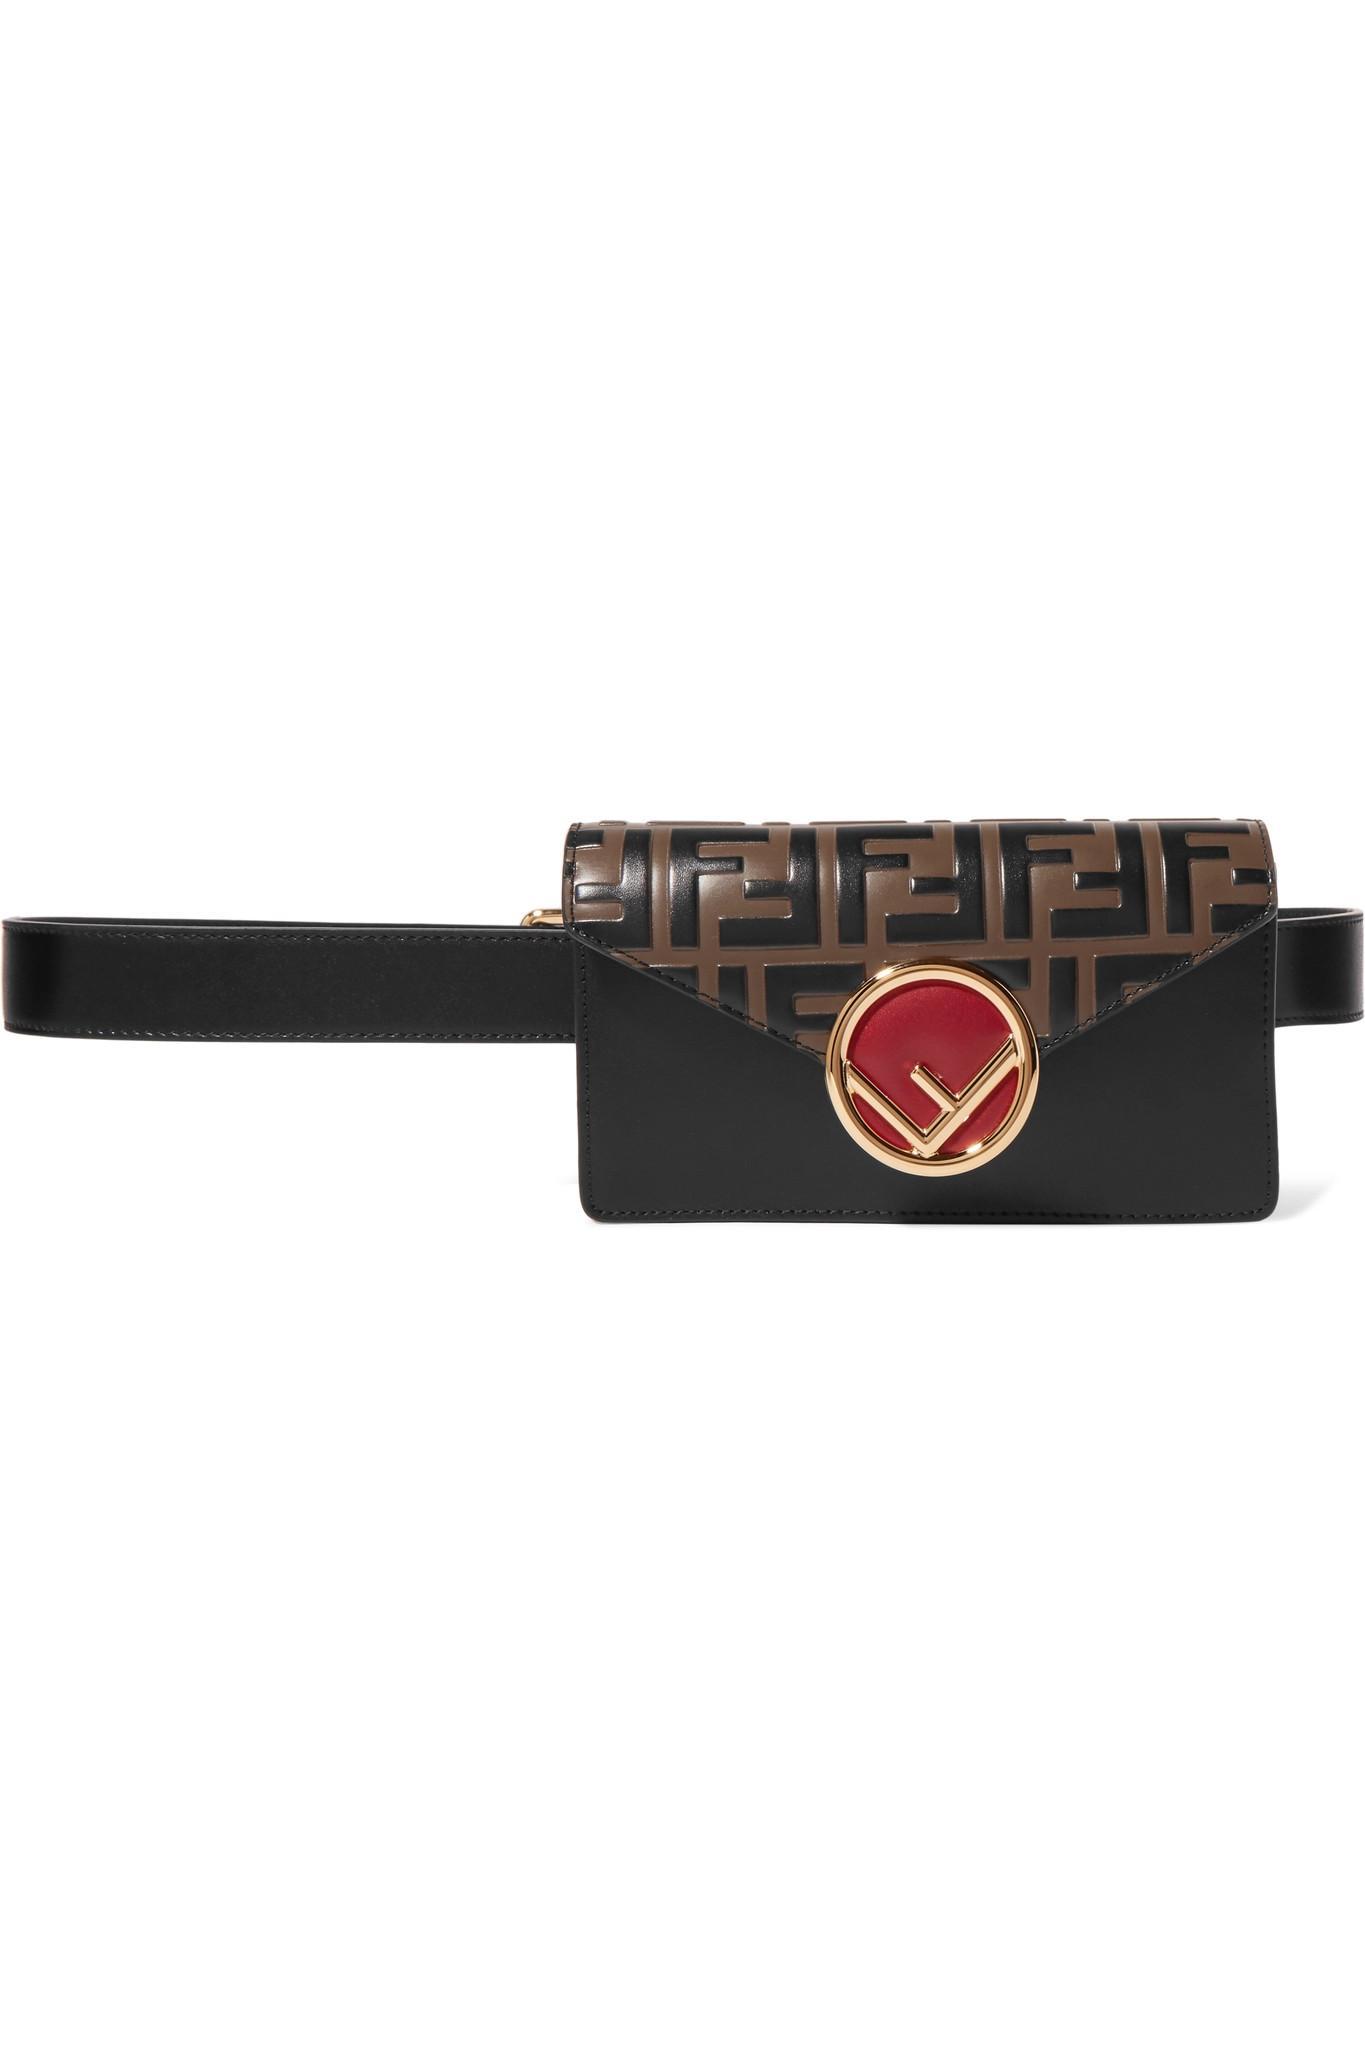 8e4f2406b7c0 Fendi Embellished Embossed Leather Belt Bag in Brown - Lyst